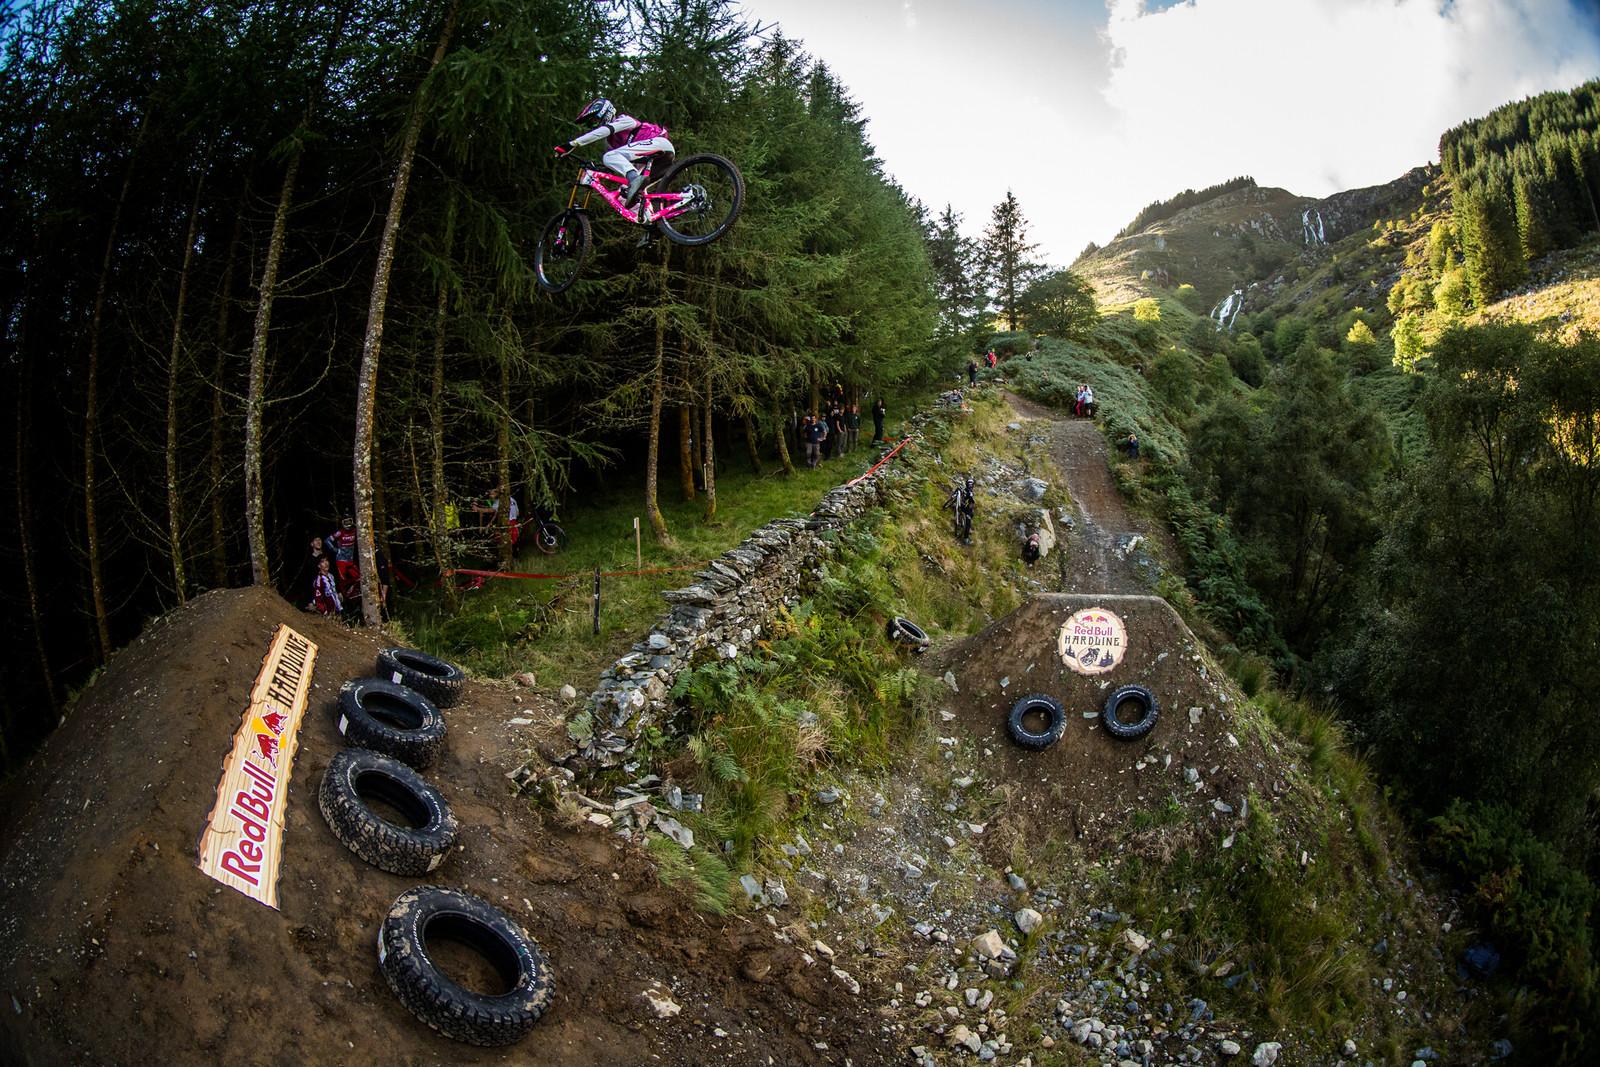 Kaos Kapow - BIG AIR PHOTO BLAST - RED BULL HARDLINE - Mountain Biking Pictures - Vital MTB